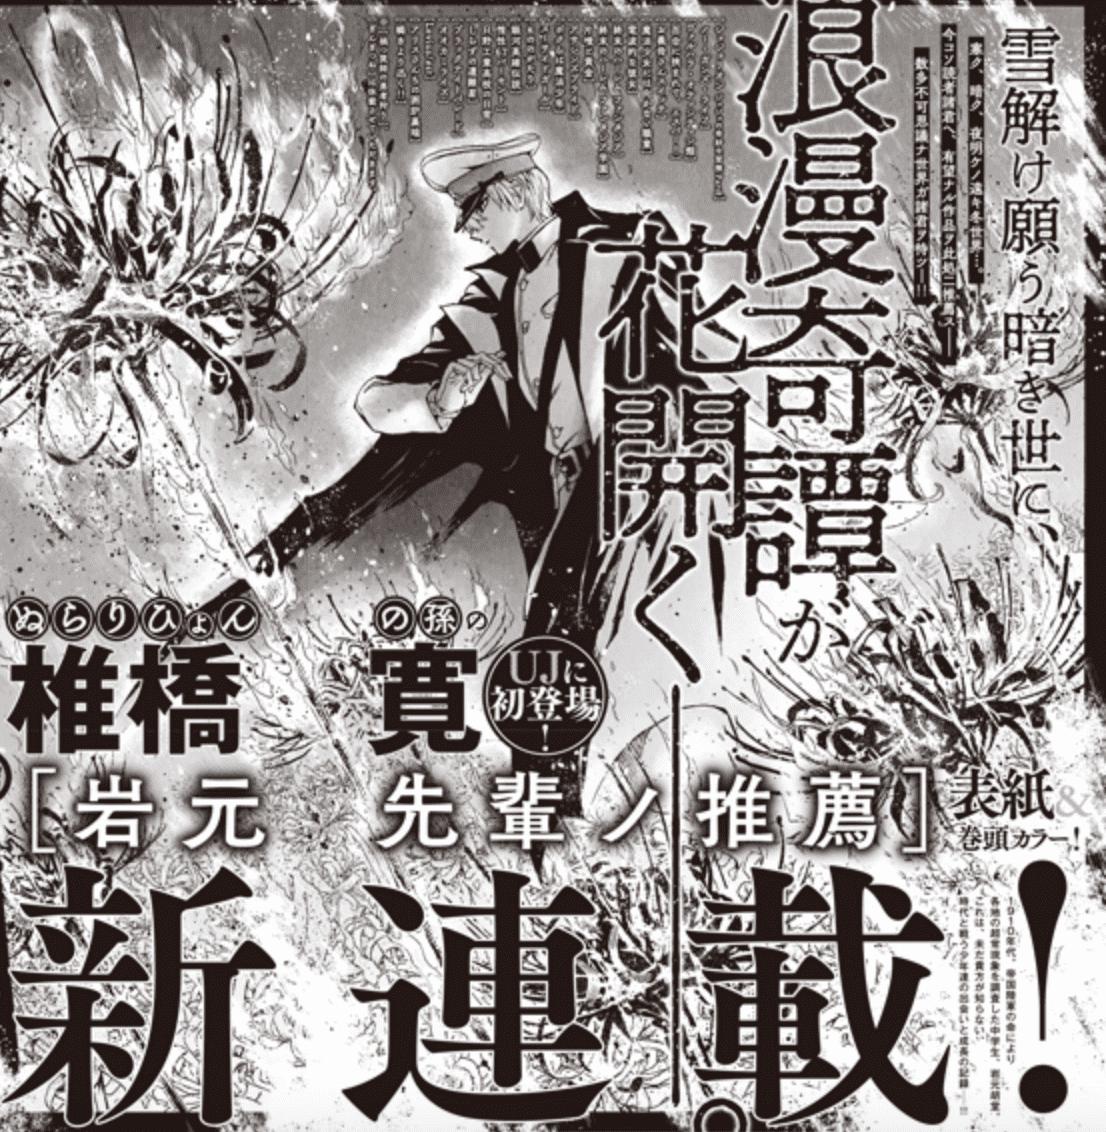 Iwamoto-Senpai no Suisen Affiche